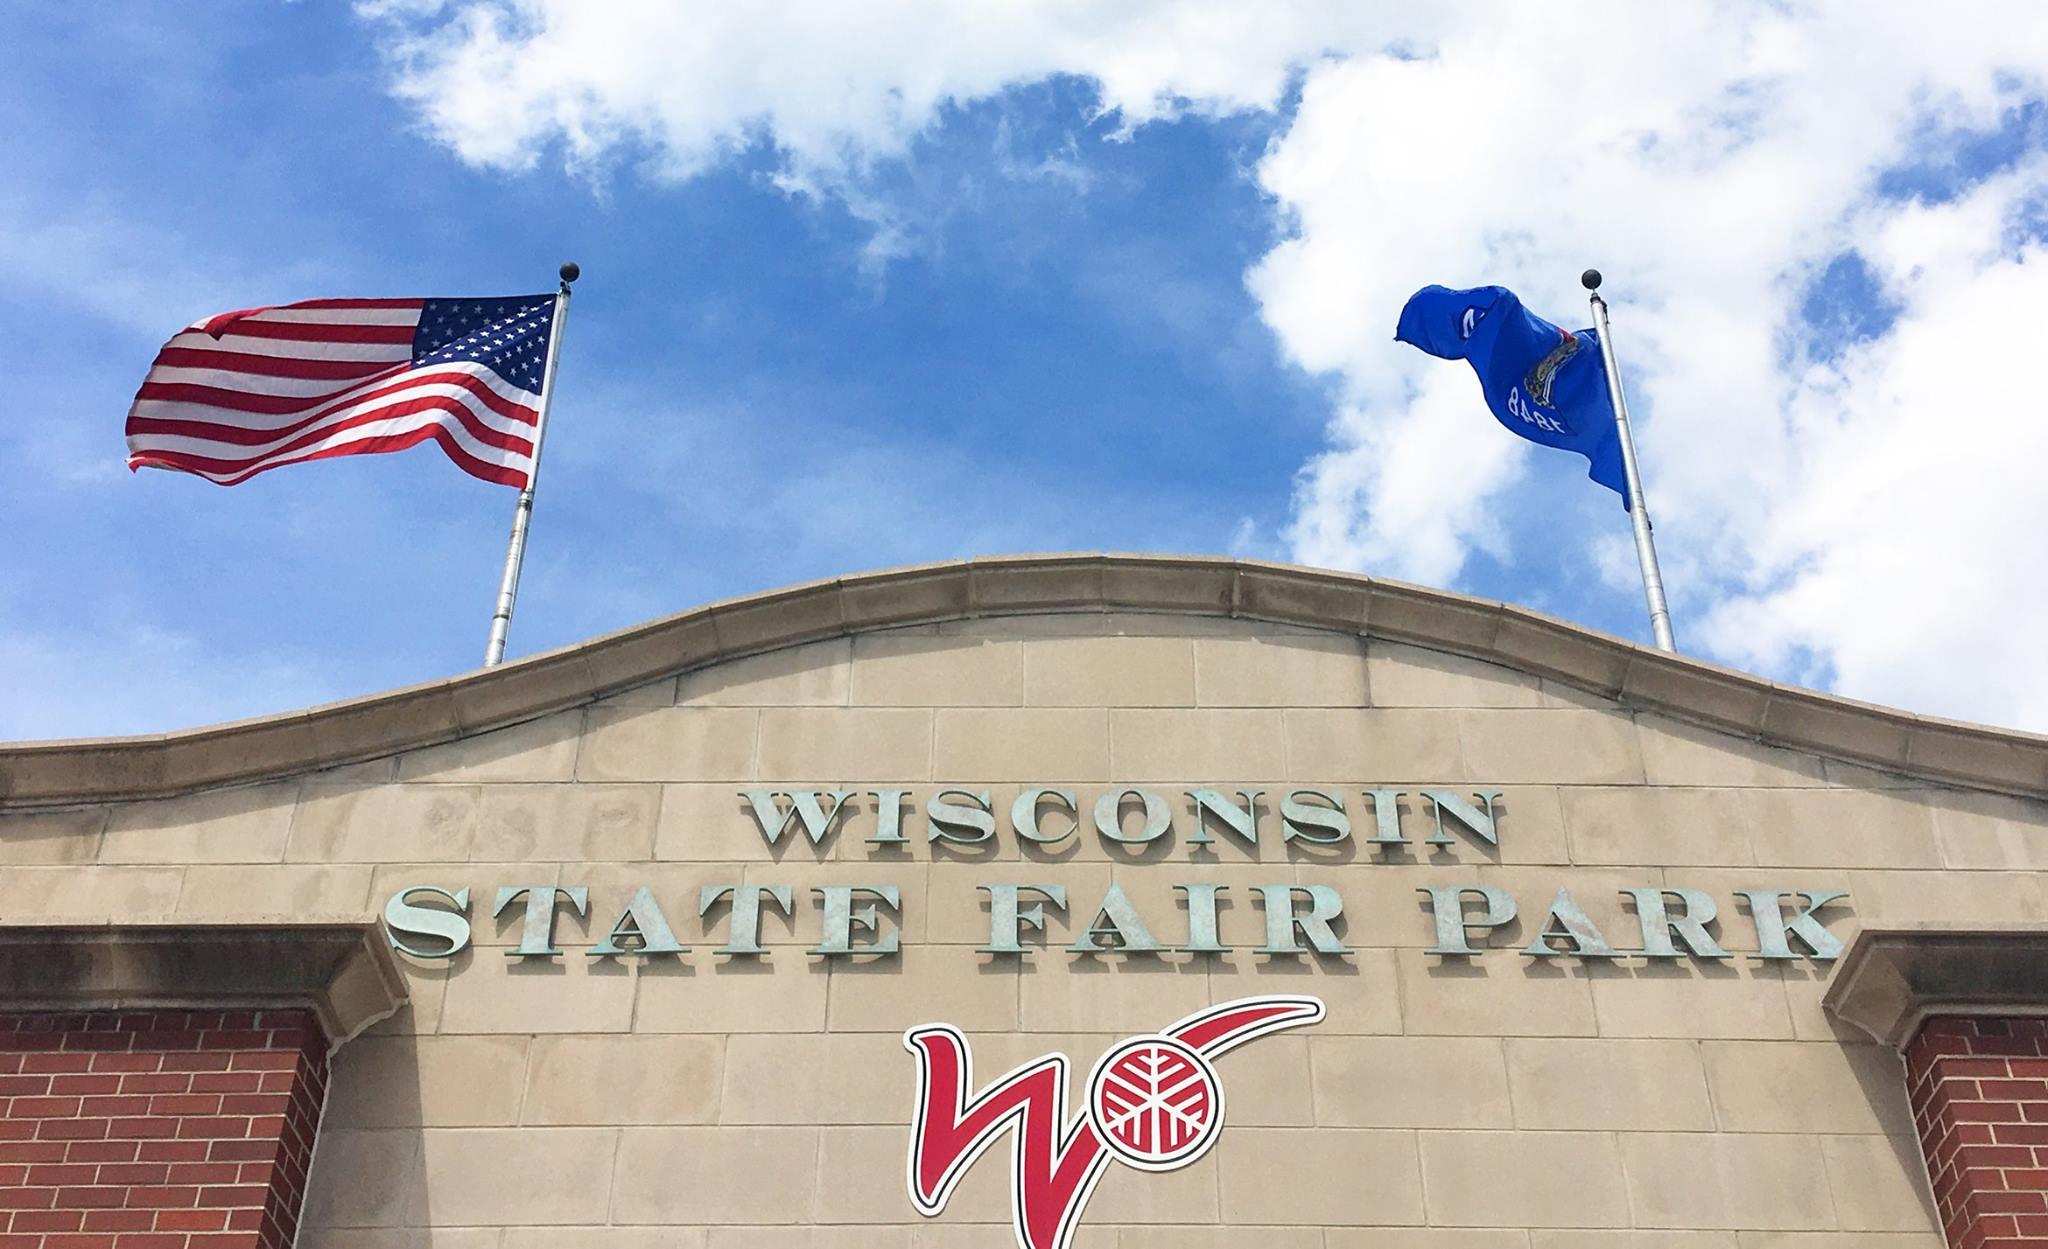 Courtesy: Wisconsin State Fair/Facebook